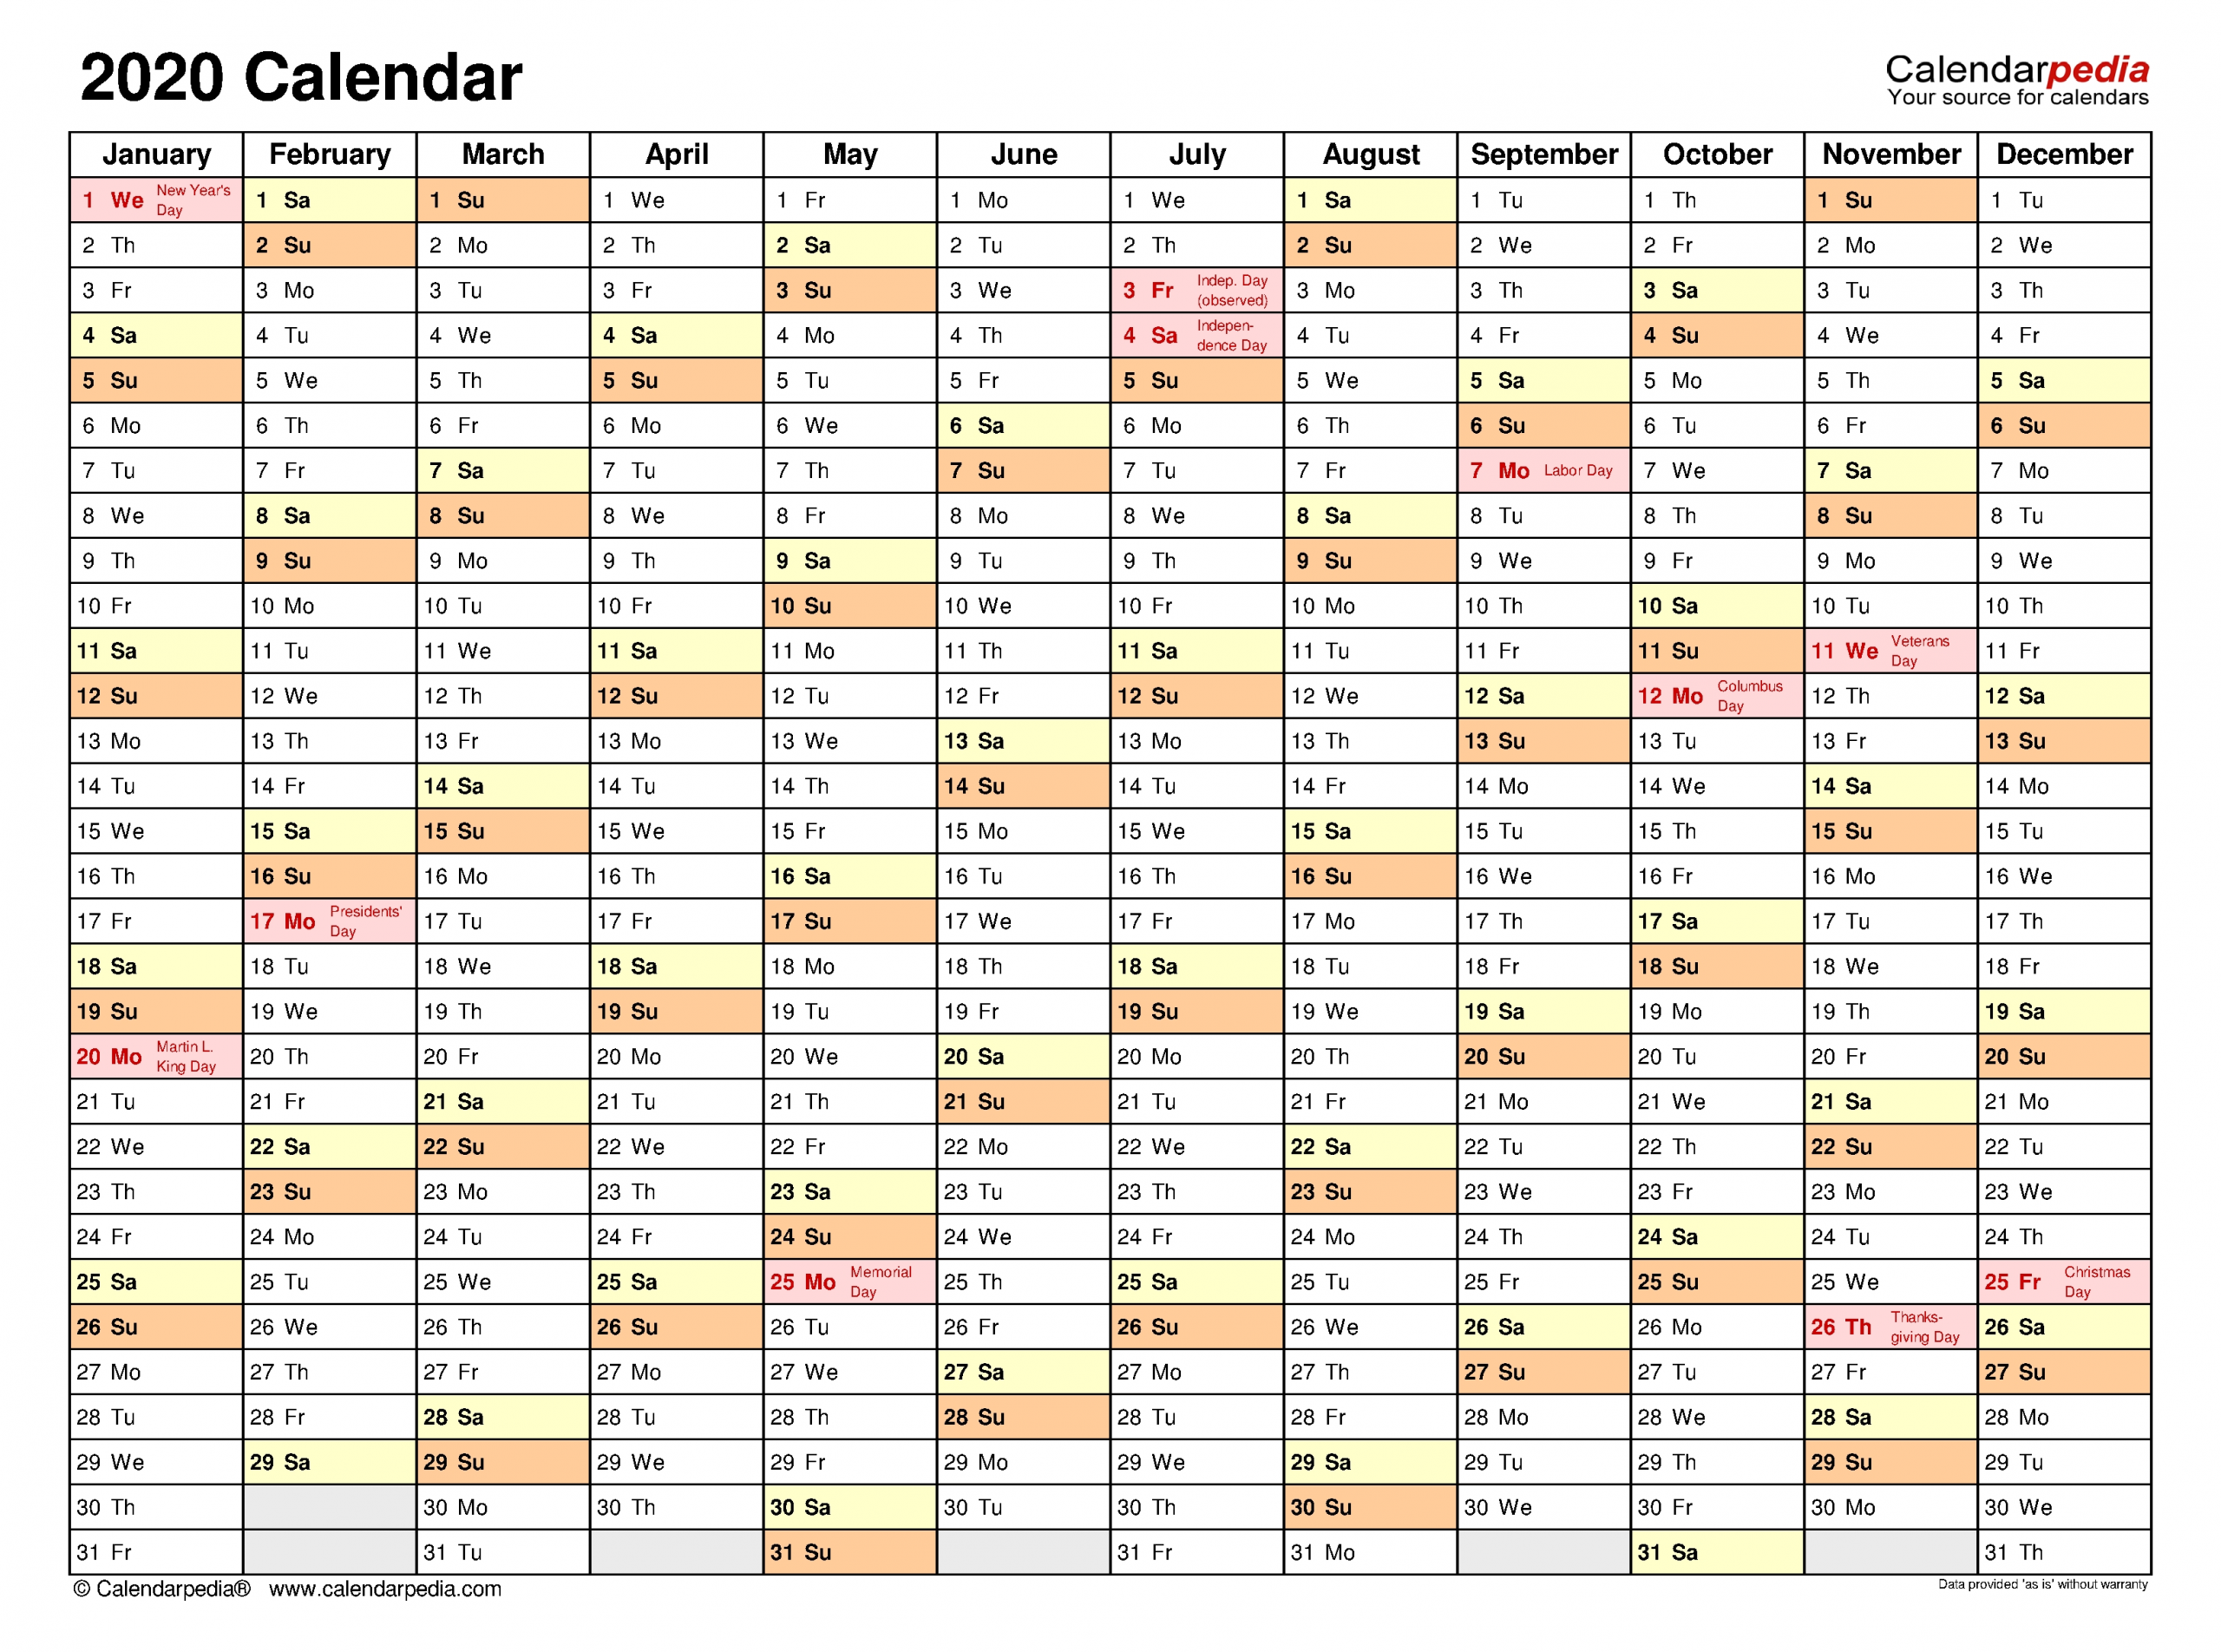 2020 Calendar - Free Printable Pdf Templates - Calendarpedia  A3 Calendar Template